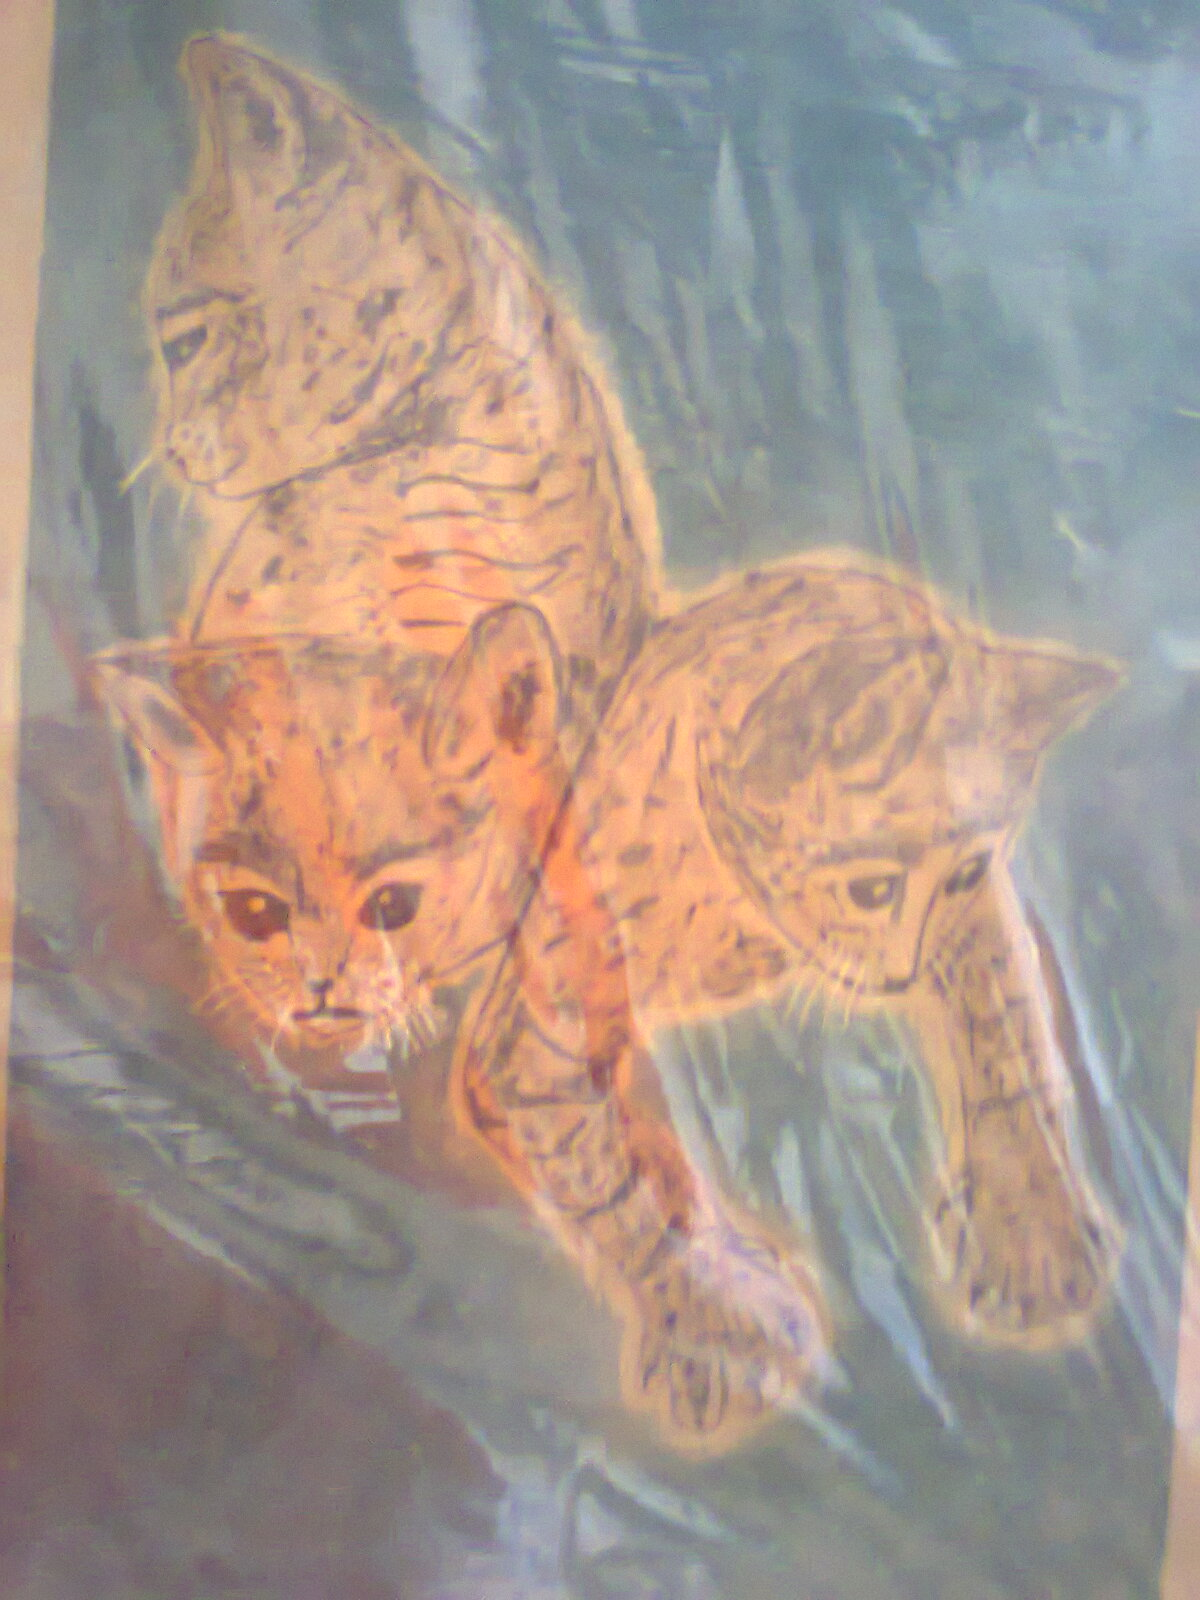 Kreasi Seni Ku: Berkarya Seni dengan Menggambar Ilustrasi ...